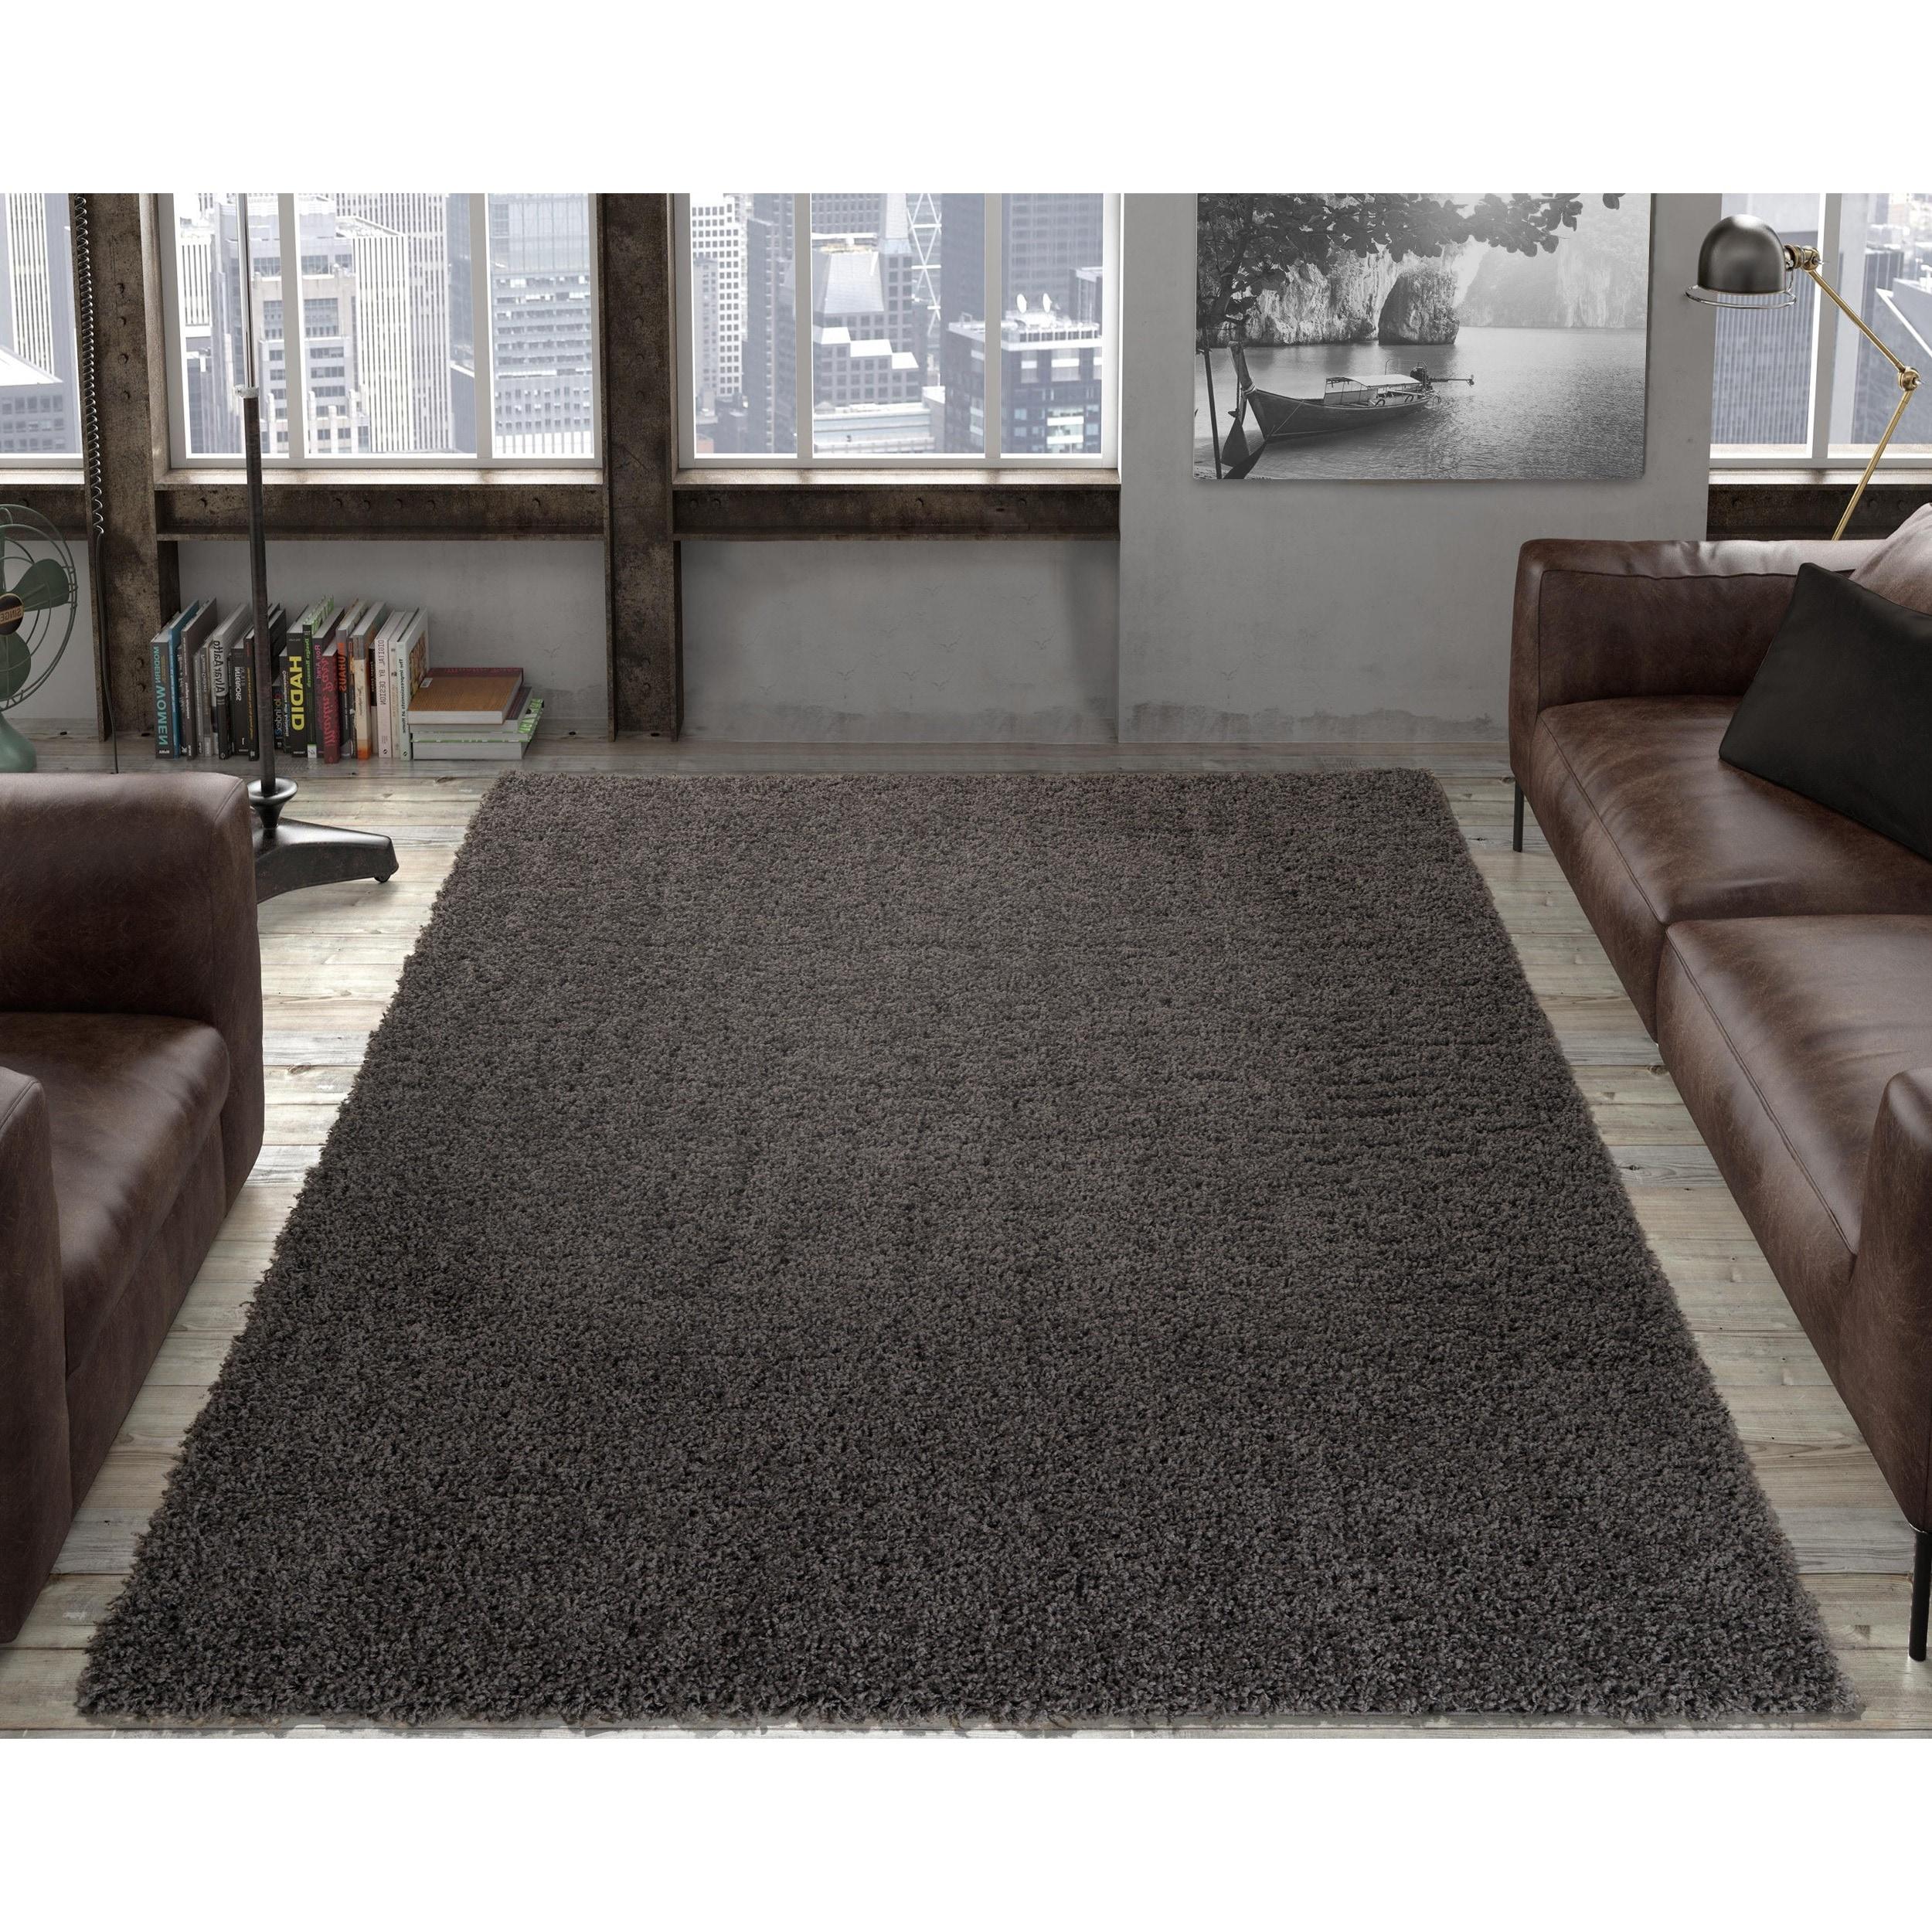 Ottomanson cozy solid color contemporary soft shag area rug